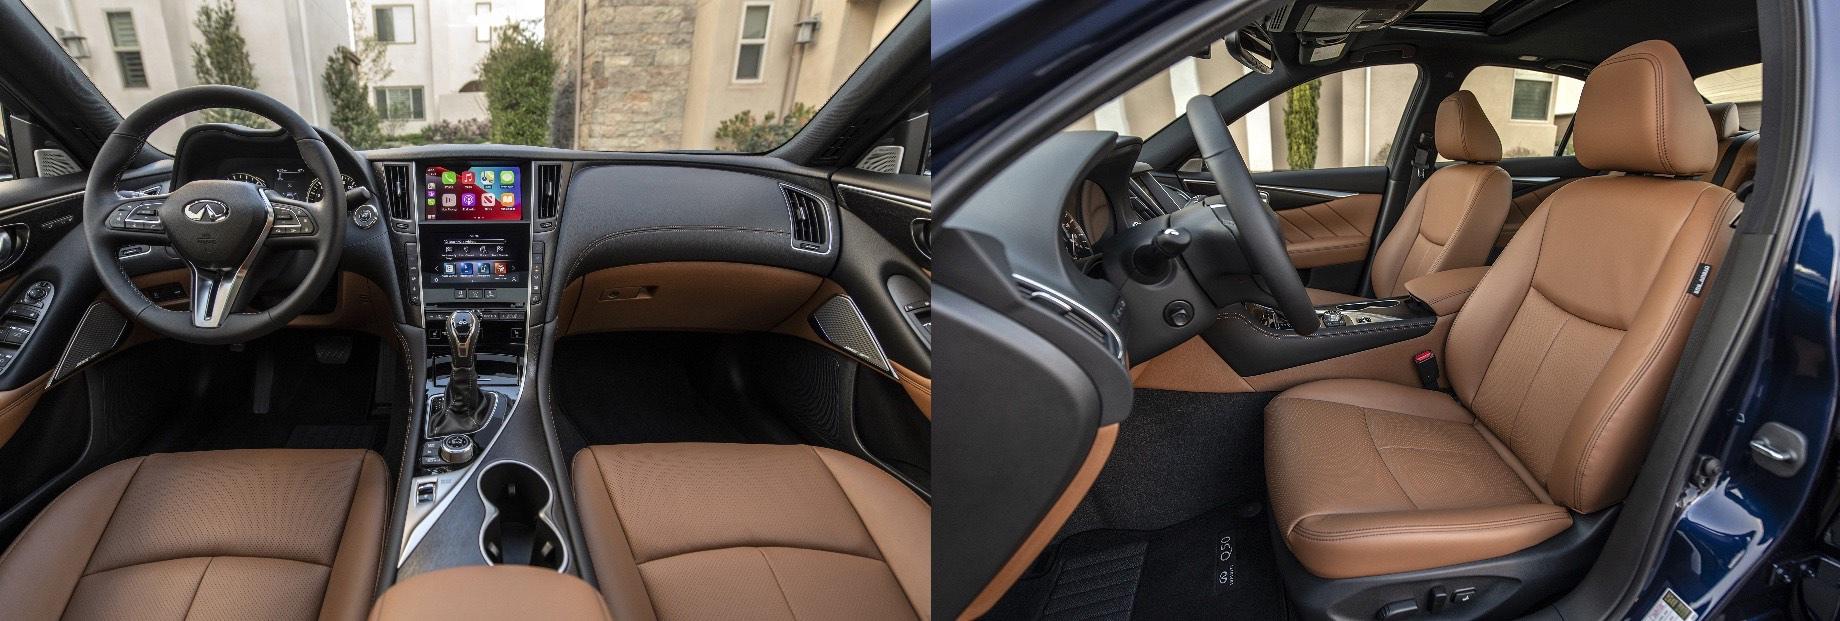 Седан Infiniti Q50 предстал в версии Signature Edition